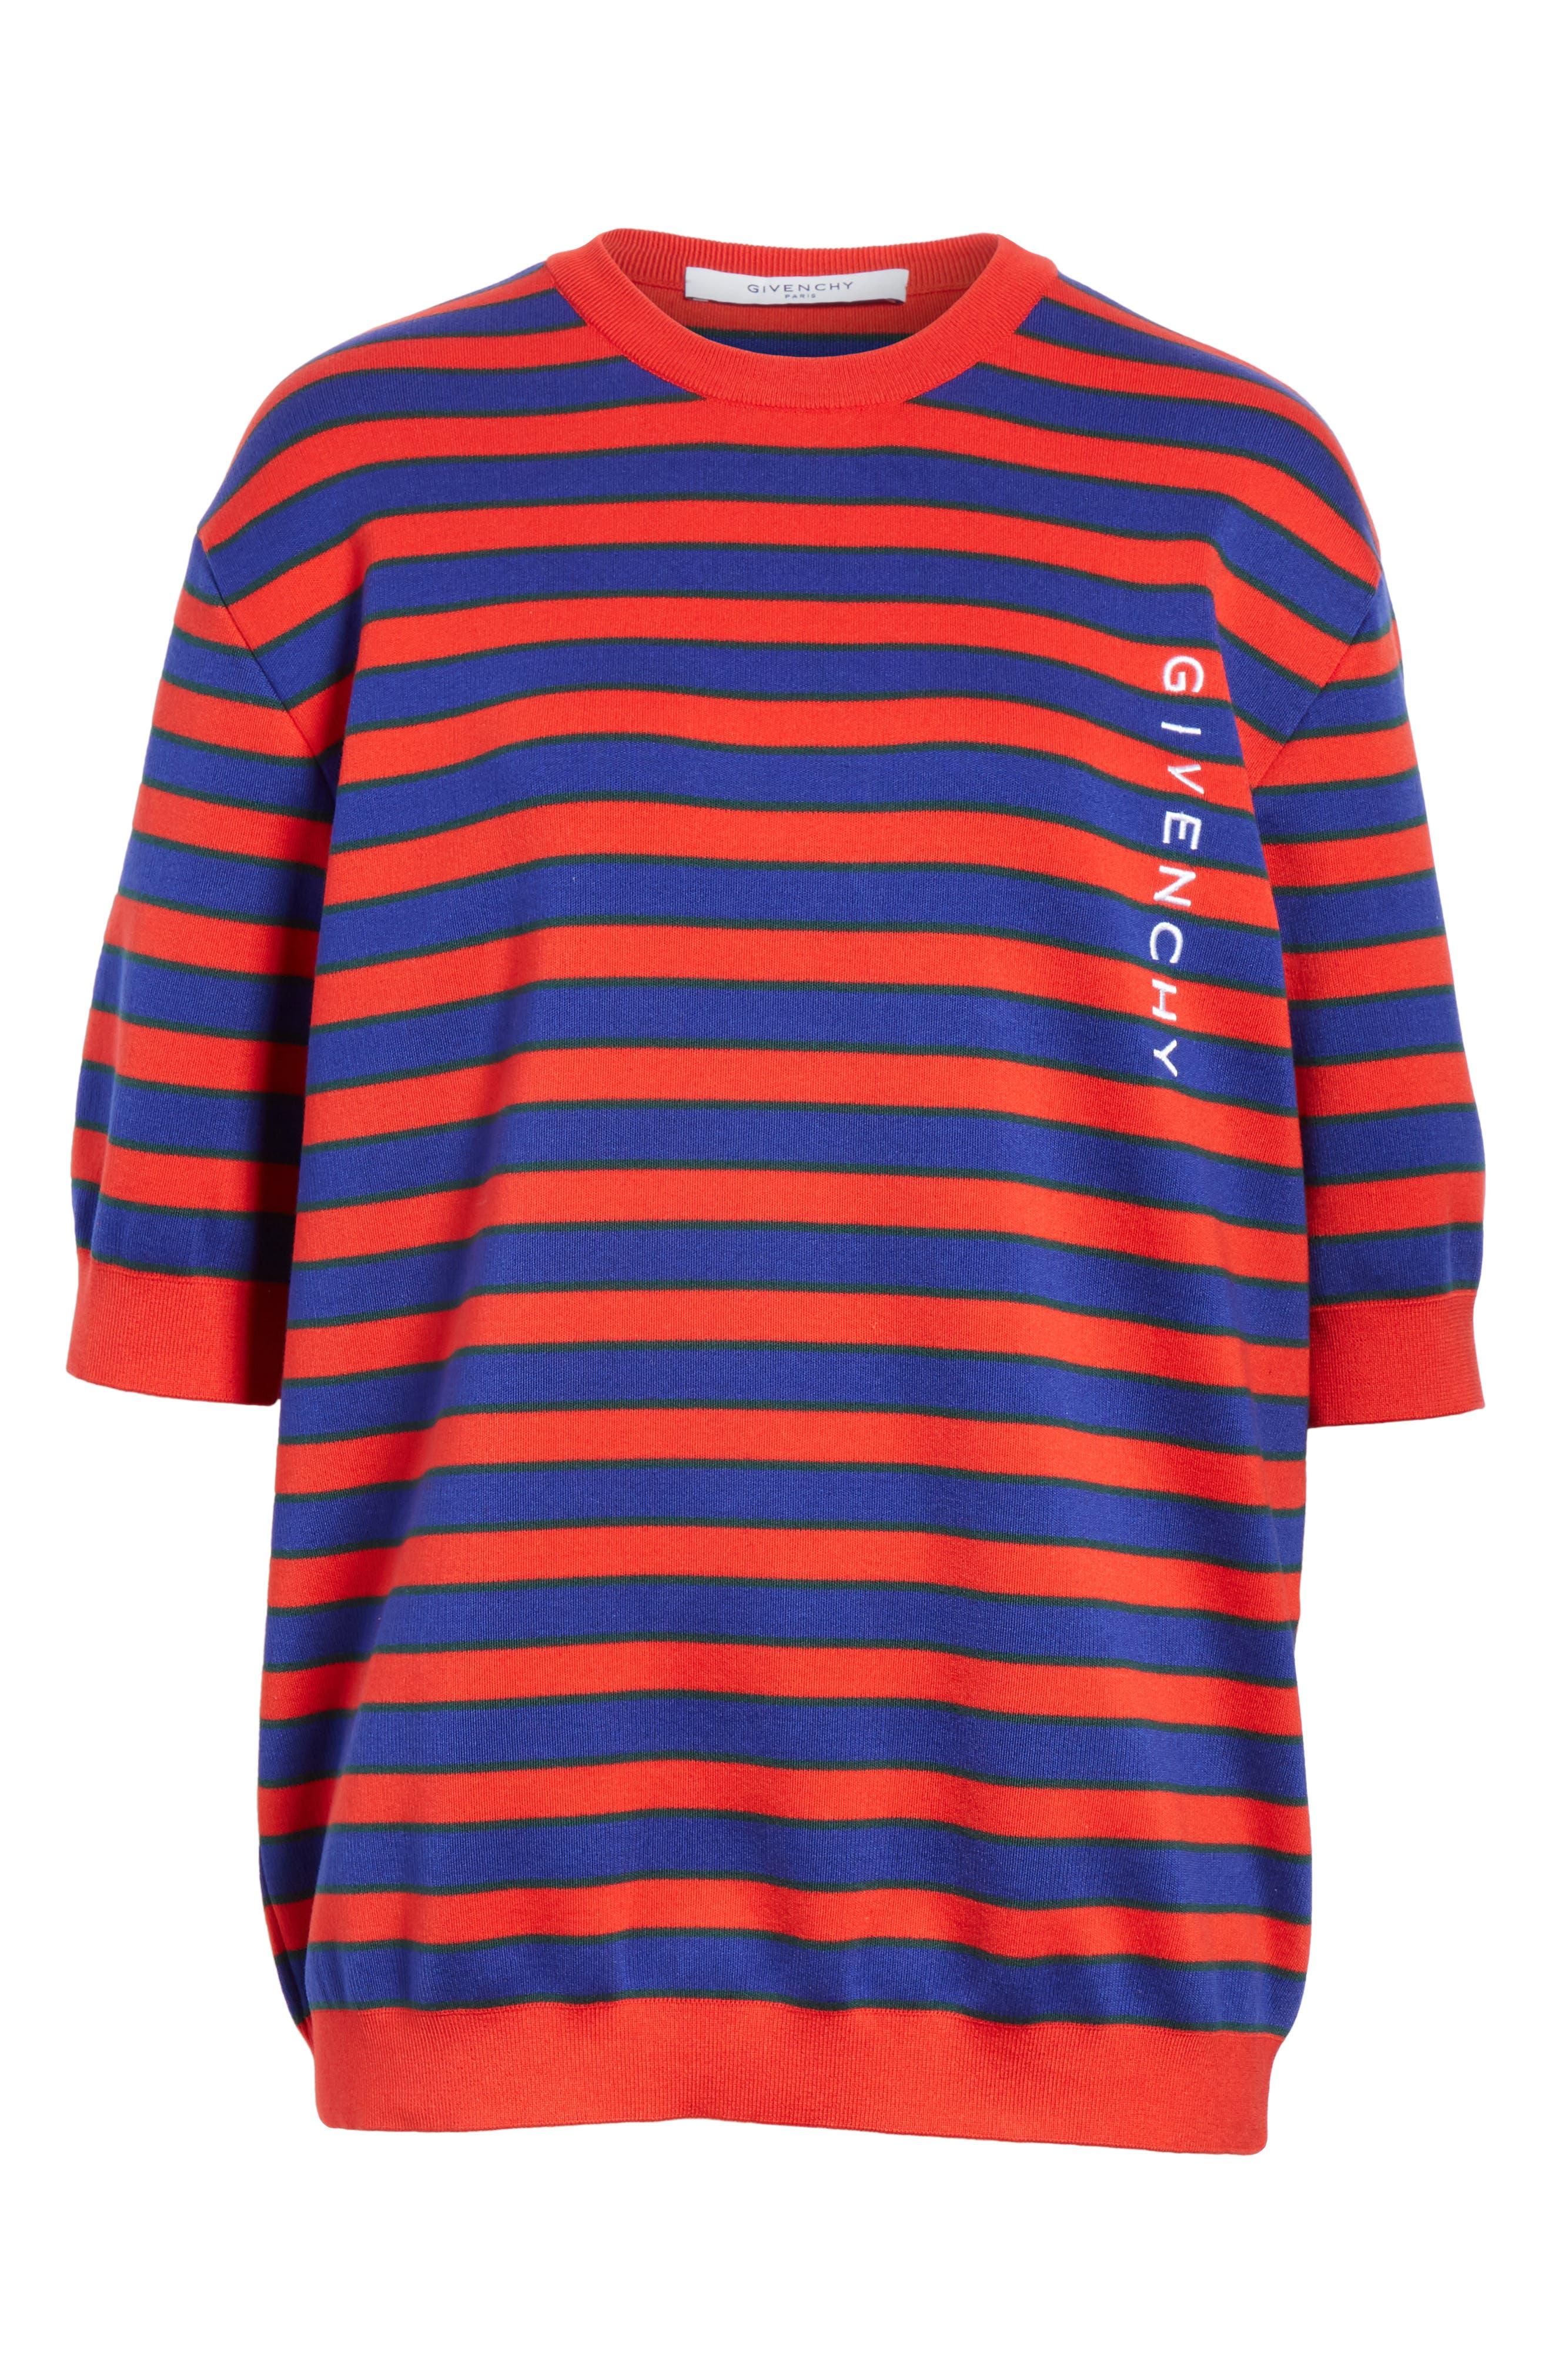 Short Sleeve Stripe Sweater,                             Alternate thumbnail 6, color,                             618